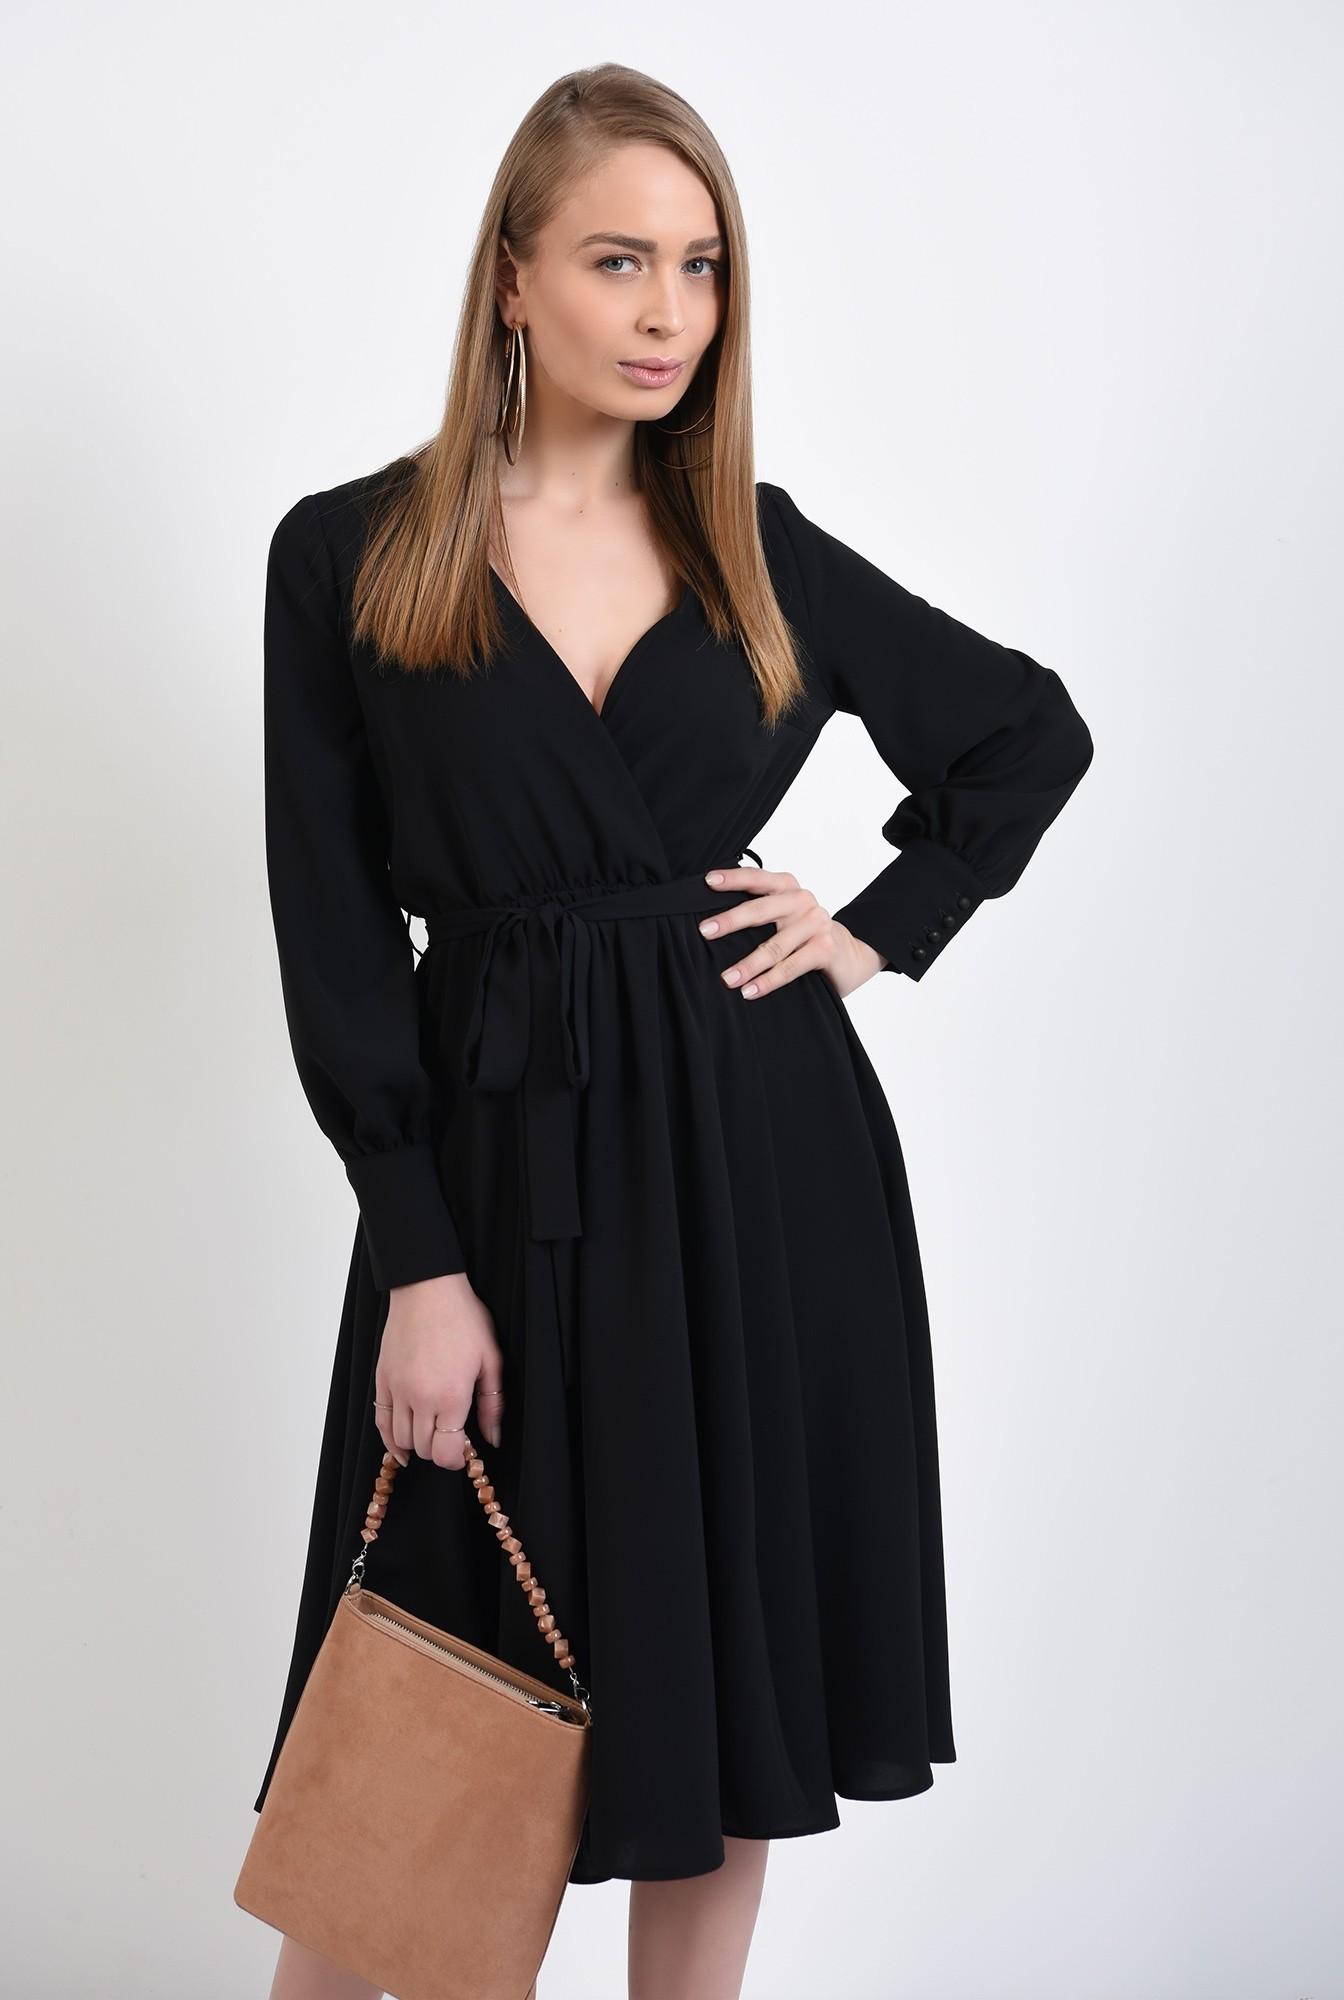 0 - rochie neagra, cu anchior petrecut, midi, evazata, cu cordon, rochie de primavara